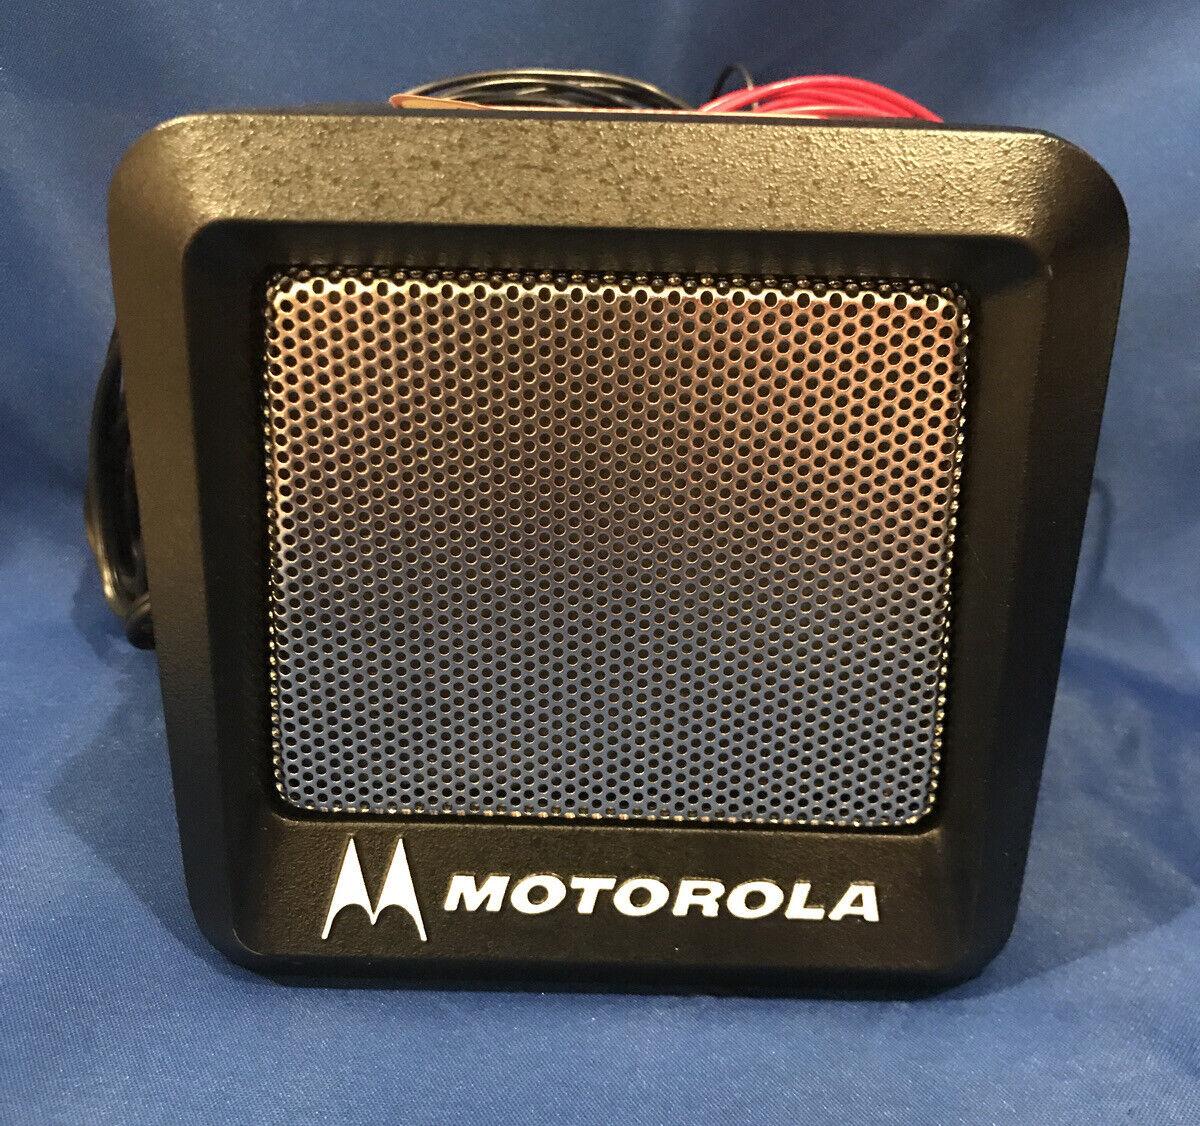 New Motorola MARATRAC Power Voice Speaker YSN4007A W/ Mounting Bracket/ Hardware. Buy it now for 625.00